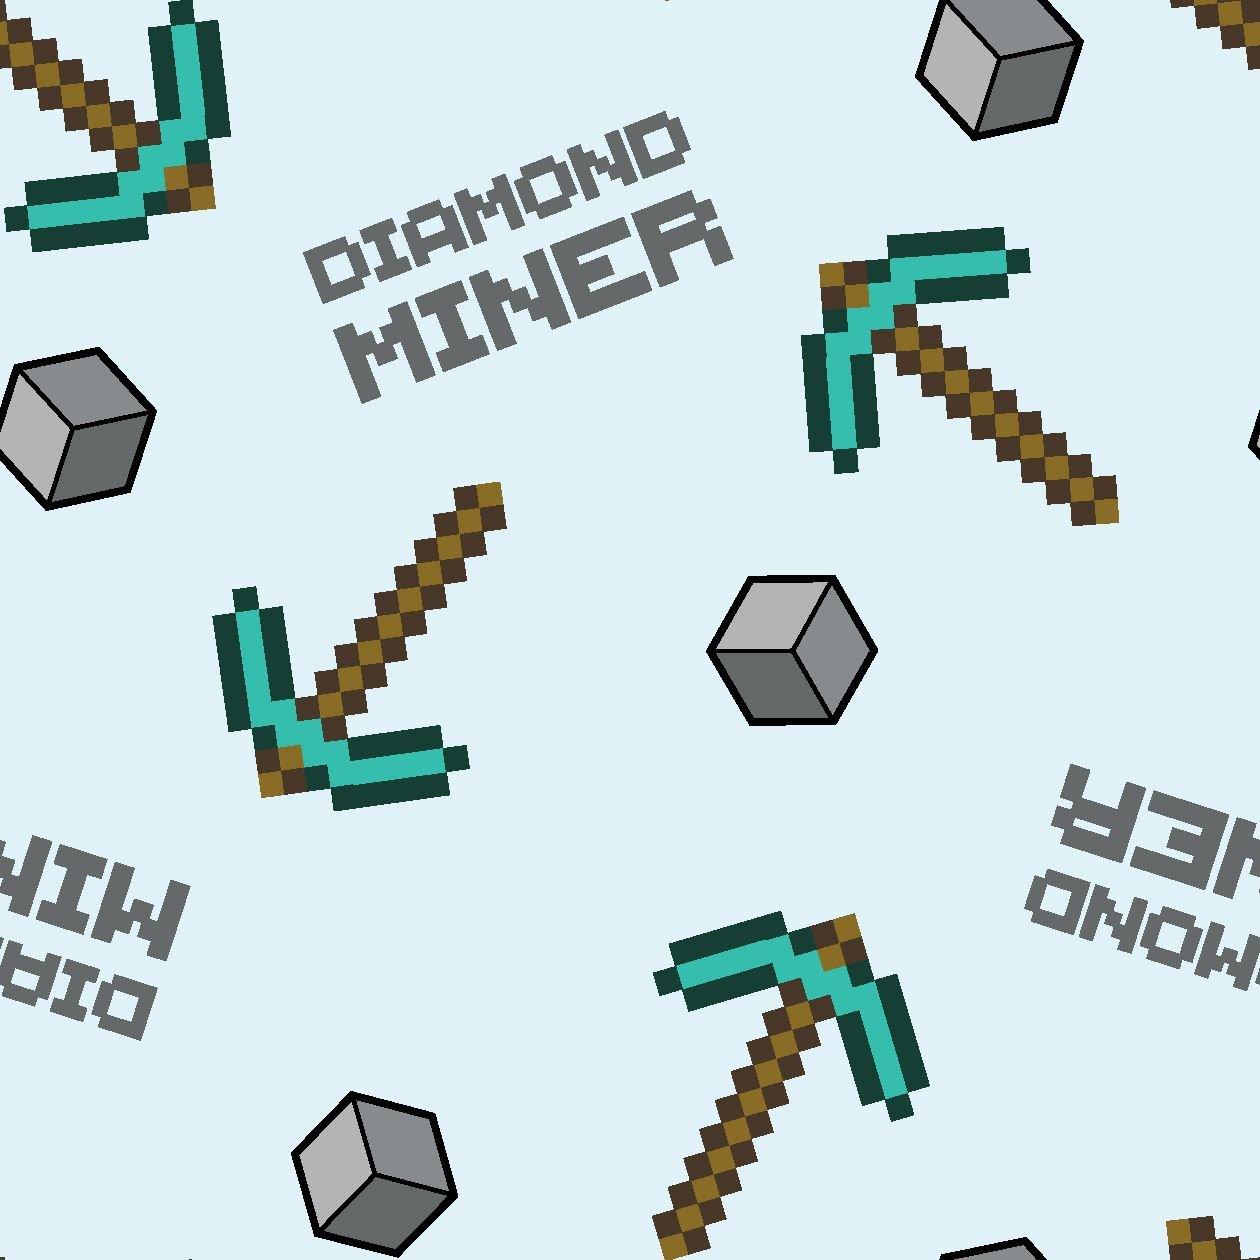 SC-Minecraft 75984-A620715 Diamond Miner